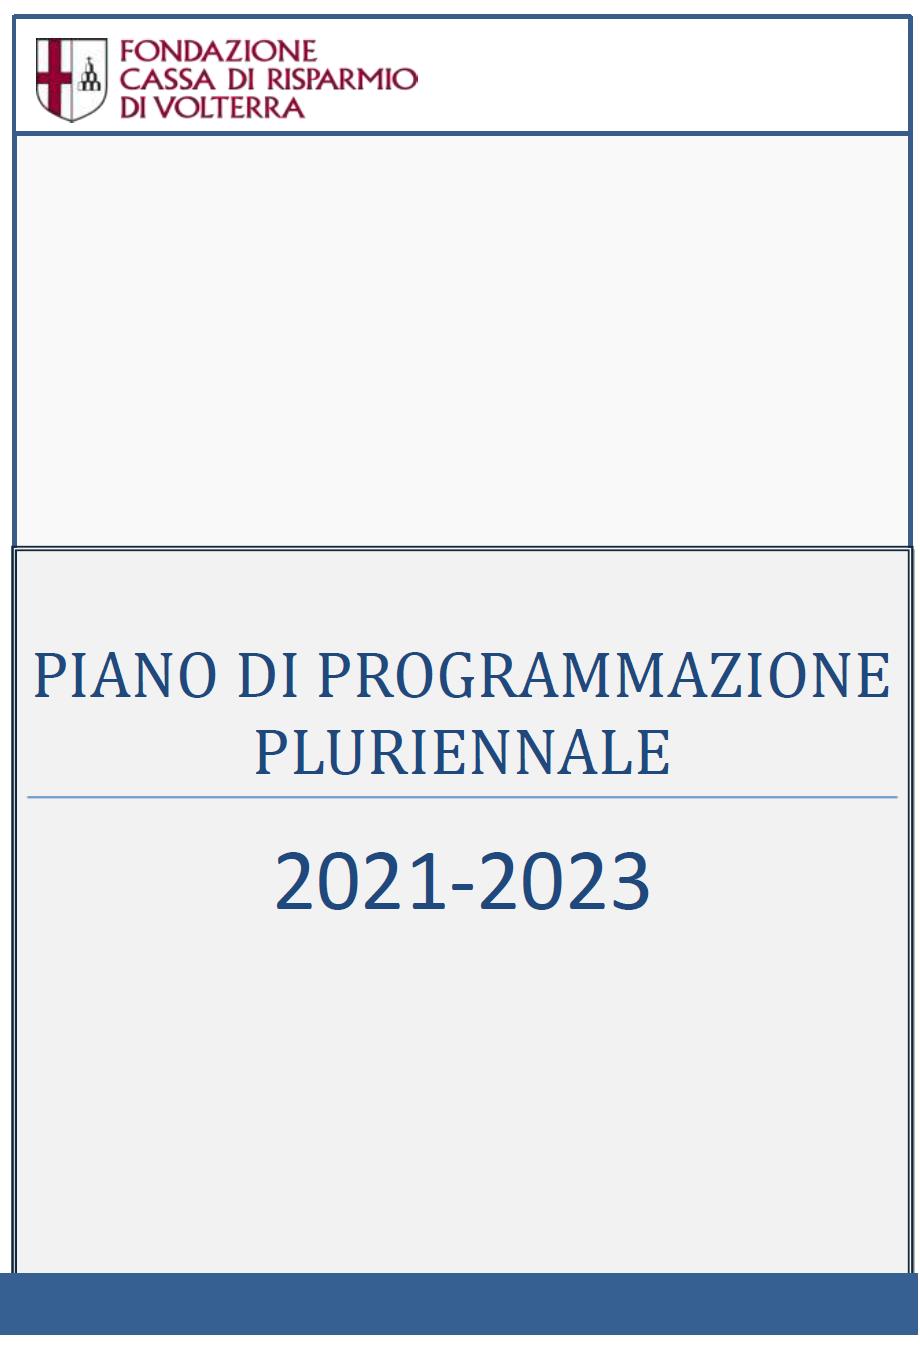 PPP 2021-2023 foto